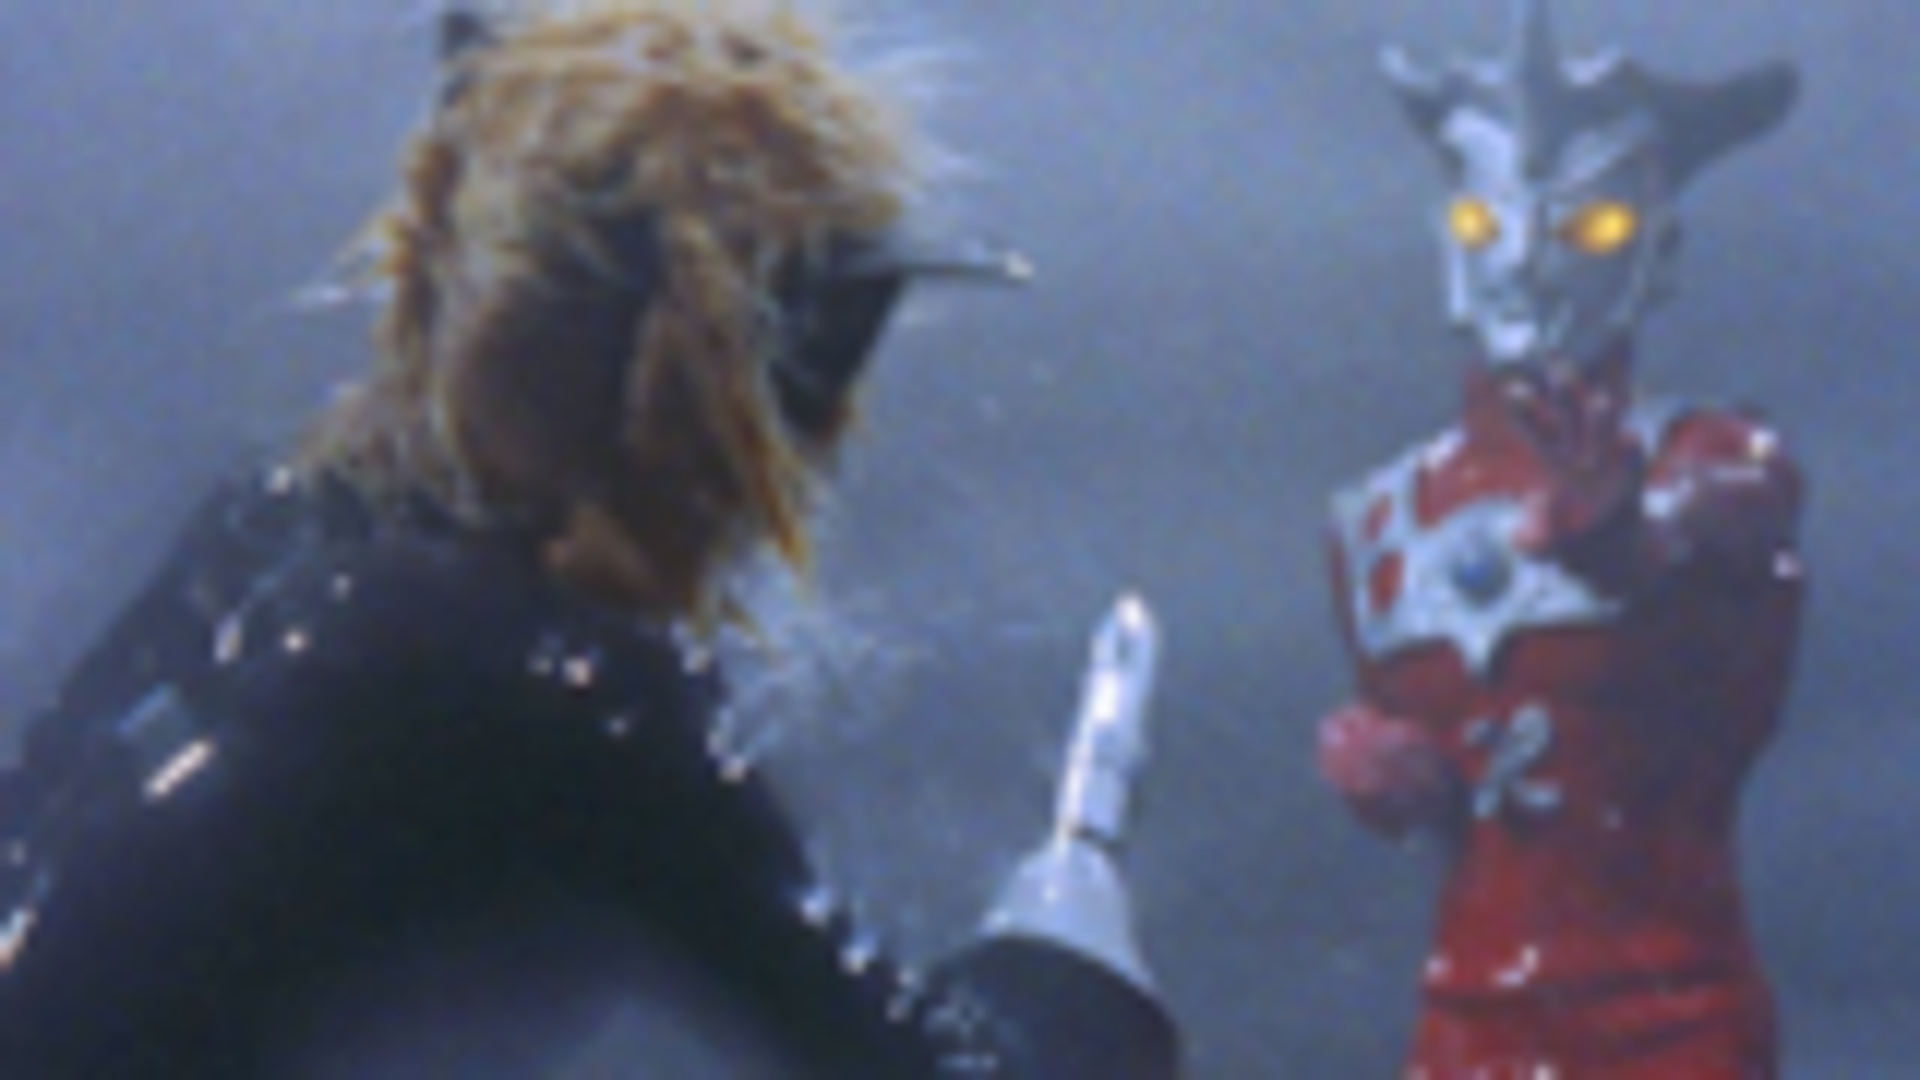 [SUK字幕组][雷欧奥特曼][新节目预告][BDrip][中日双语字幕]